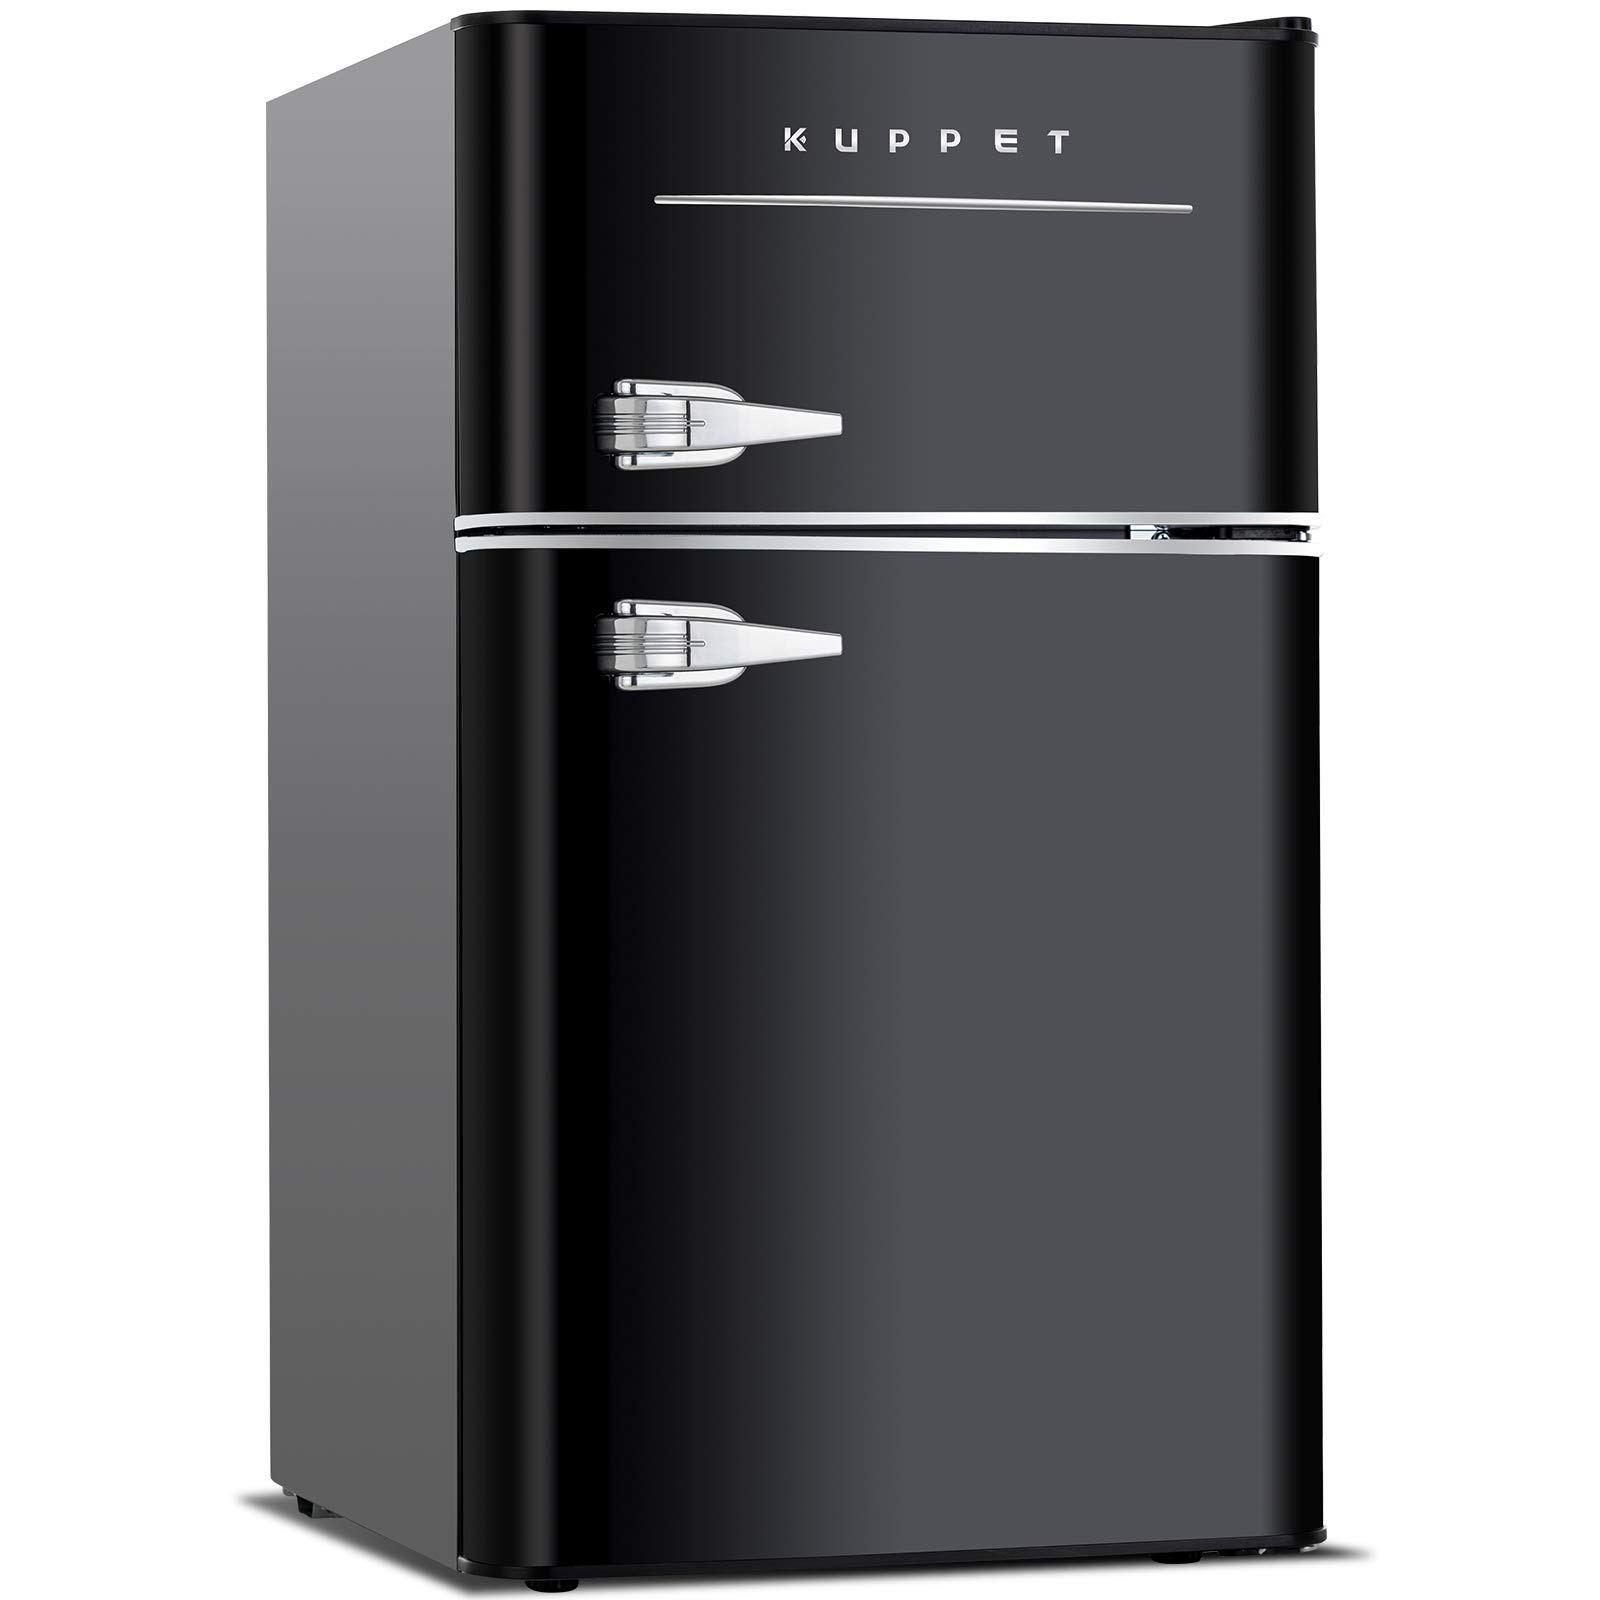 Boughtagain Awesome Goods You Bought It Again Mini Fridge With Freezer Compact Refrigerator Mini Fridge